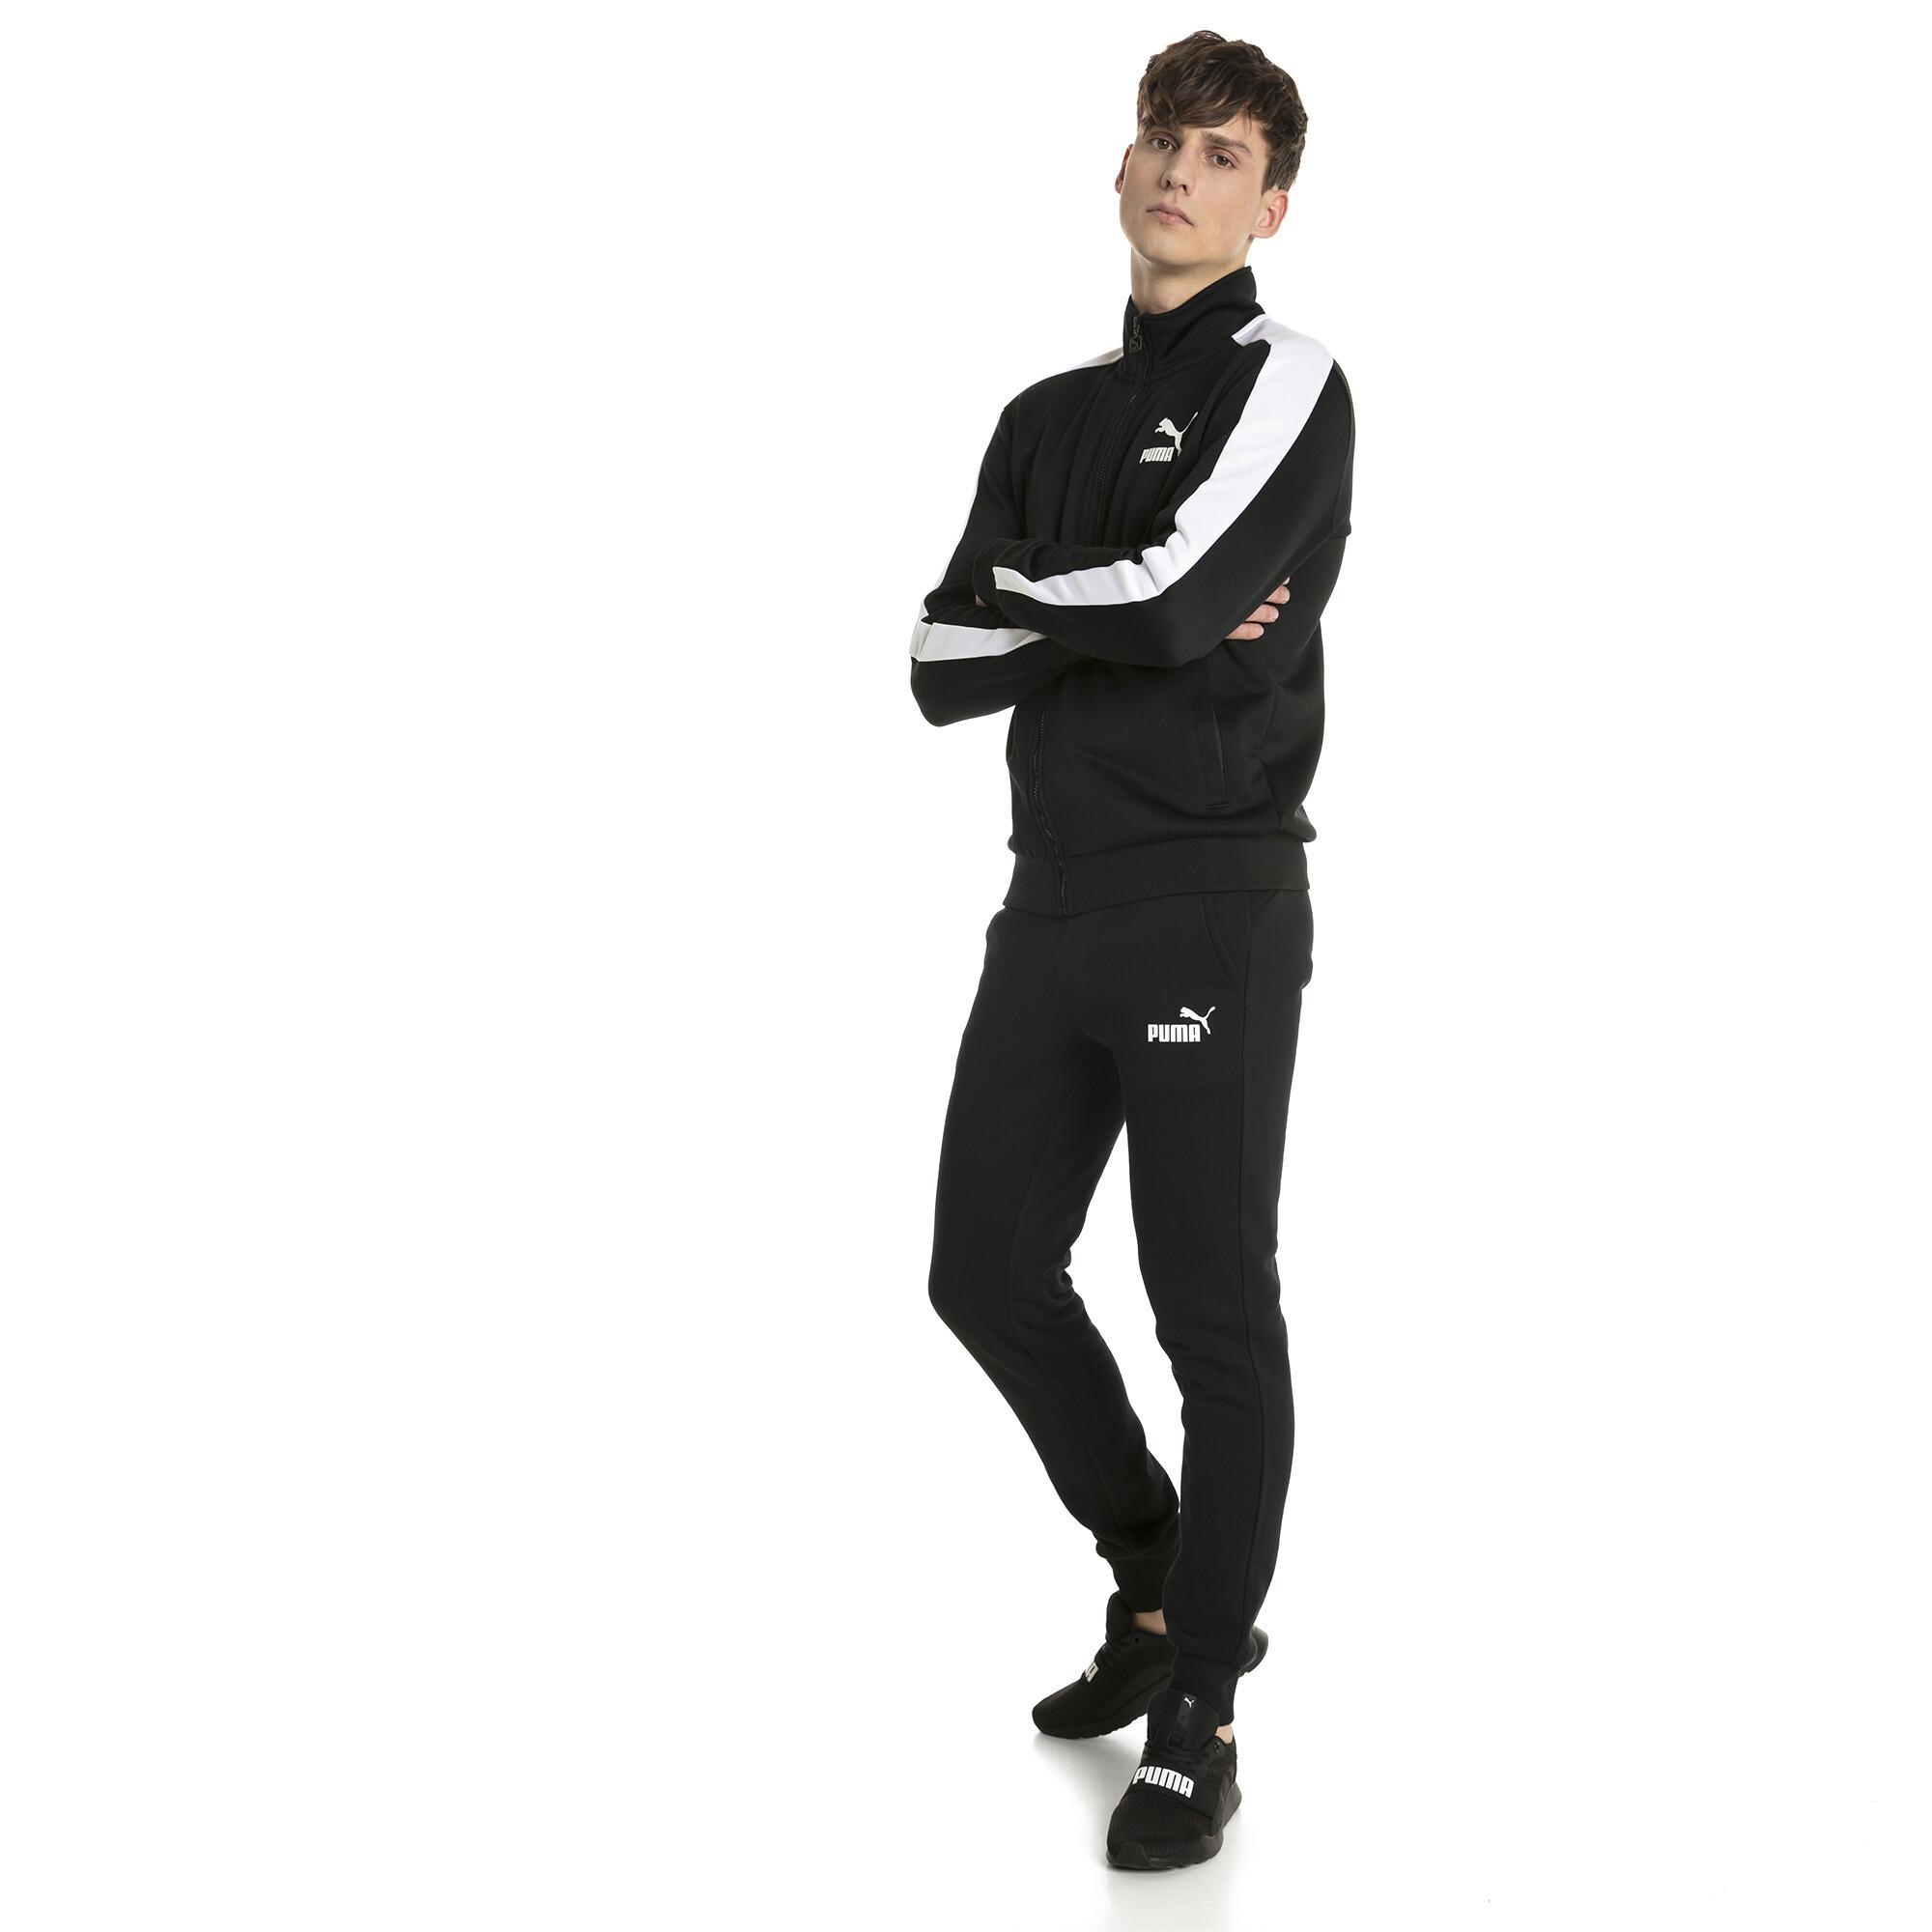 PUMA-Essentials-Men-039-s-Fleece-Knit-Pants-Men-Knitted-Pants-Basics thumbnail 15